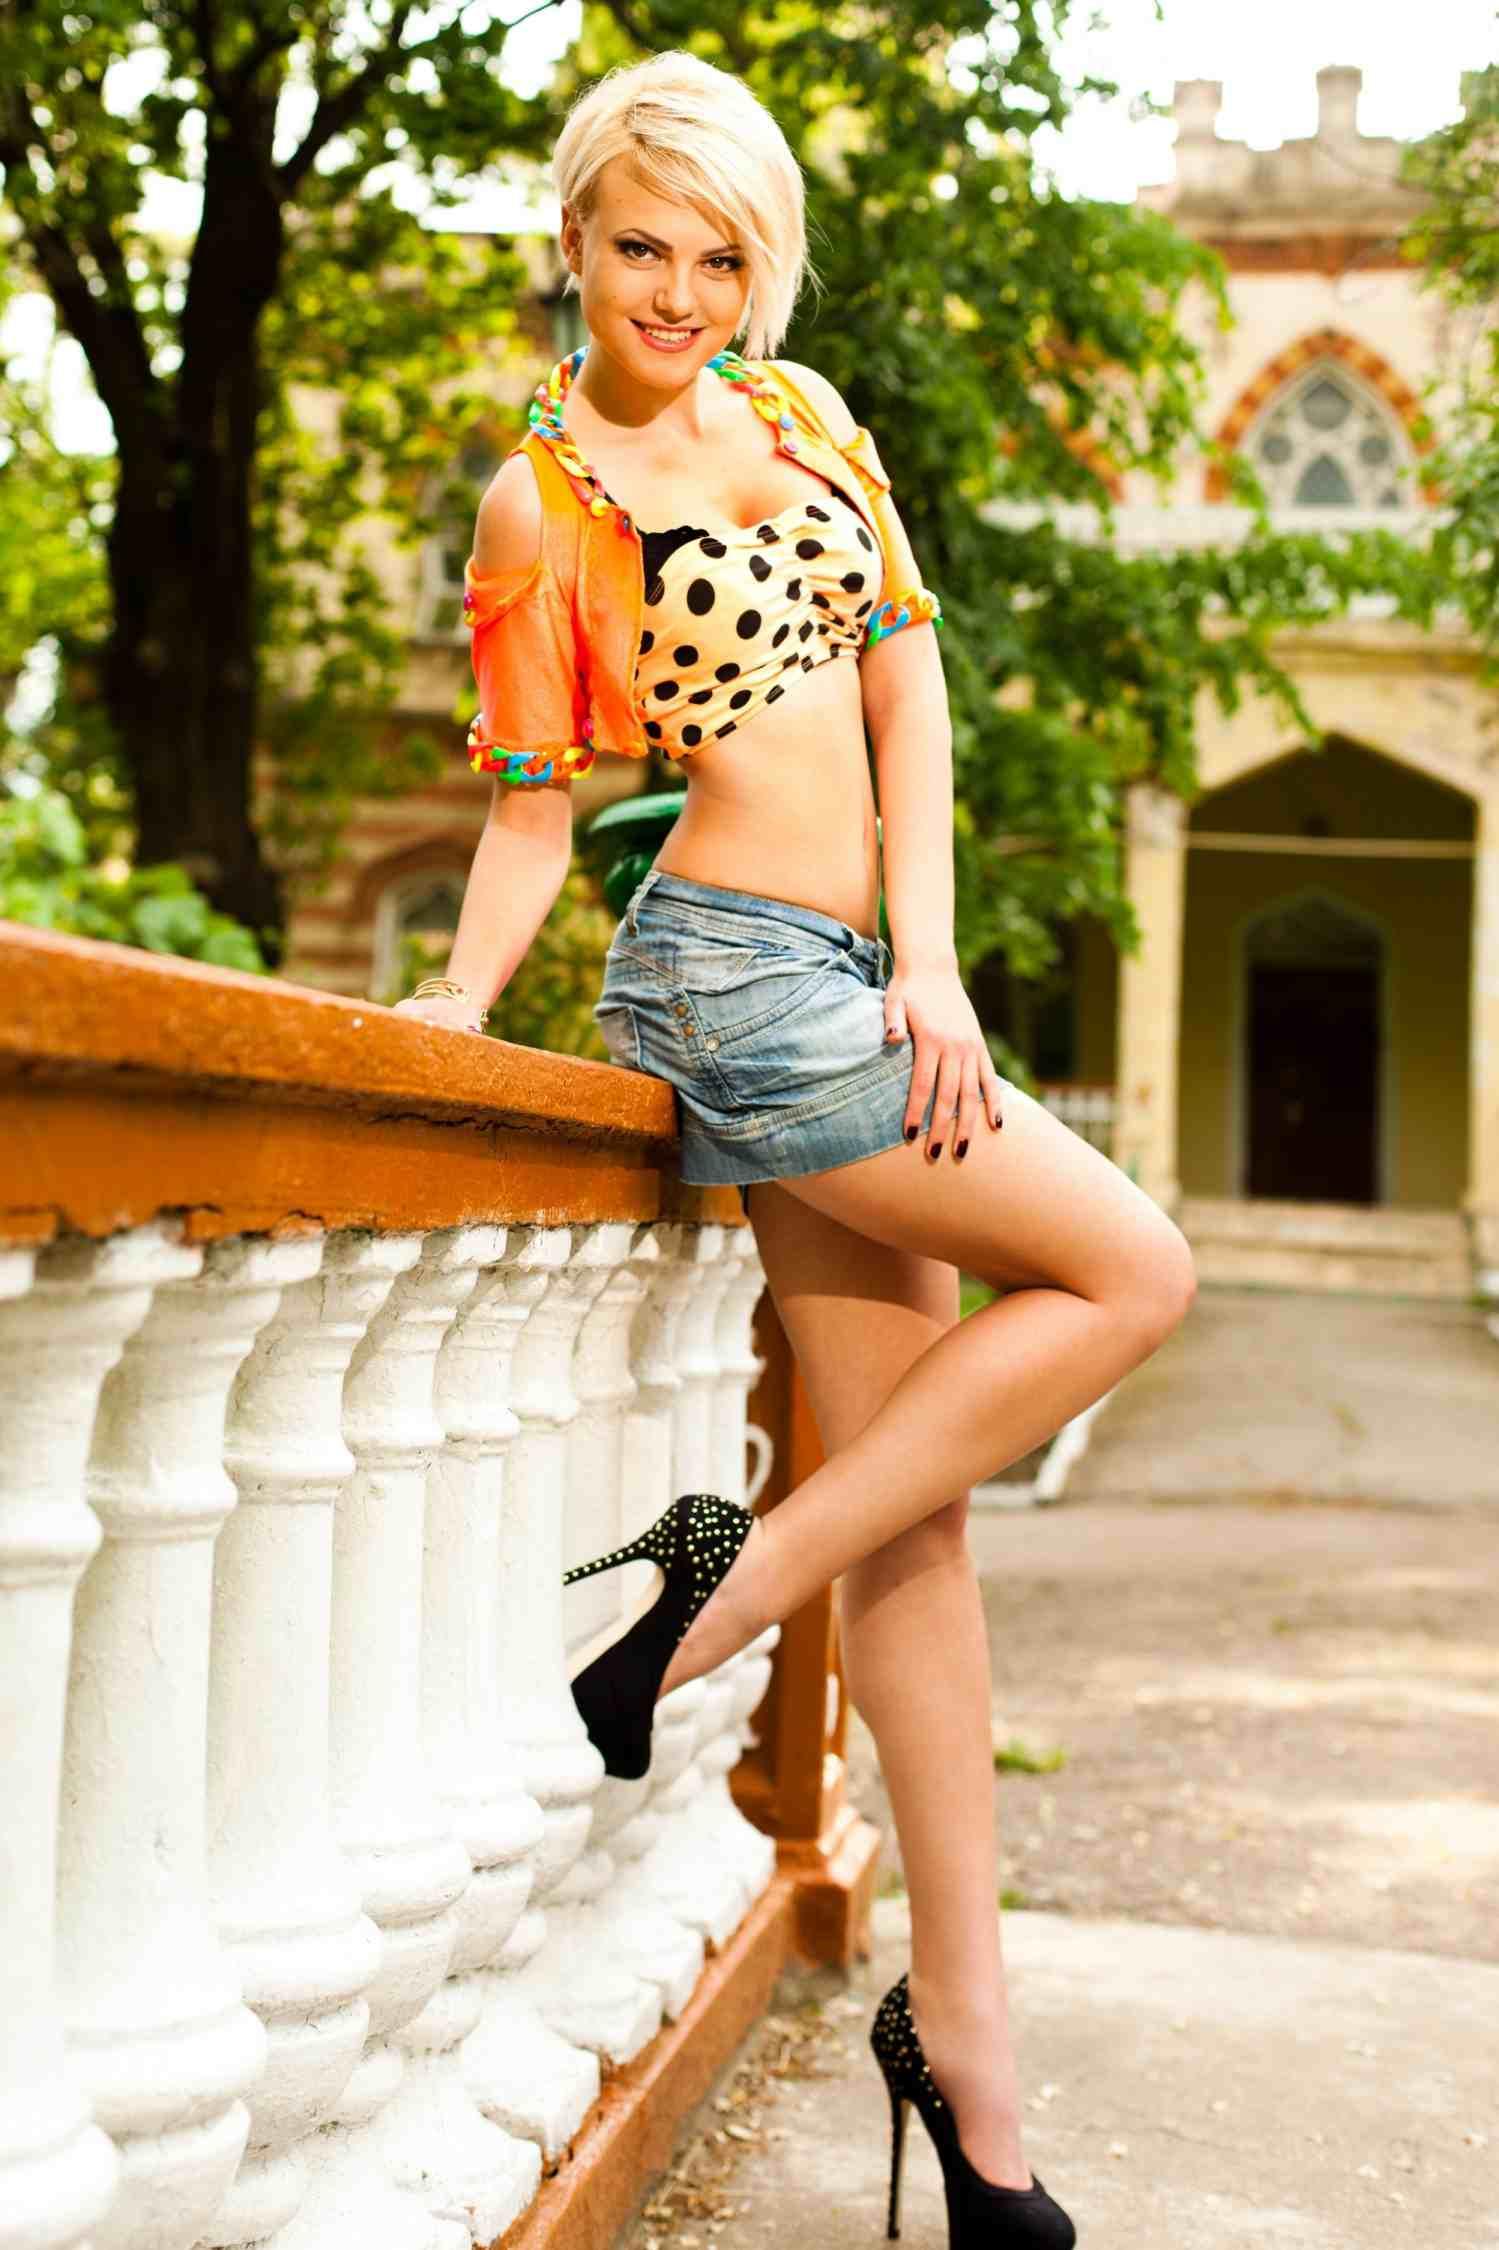 Lina hot